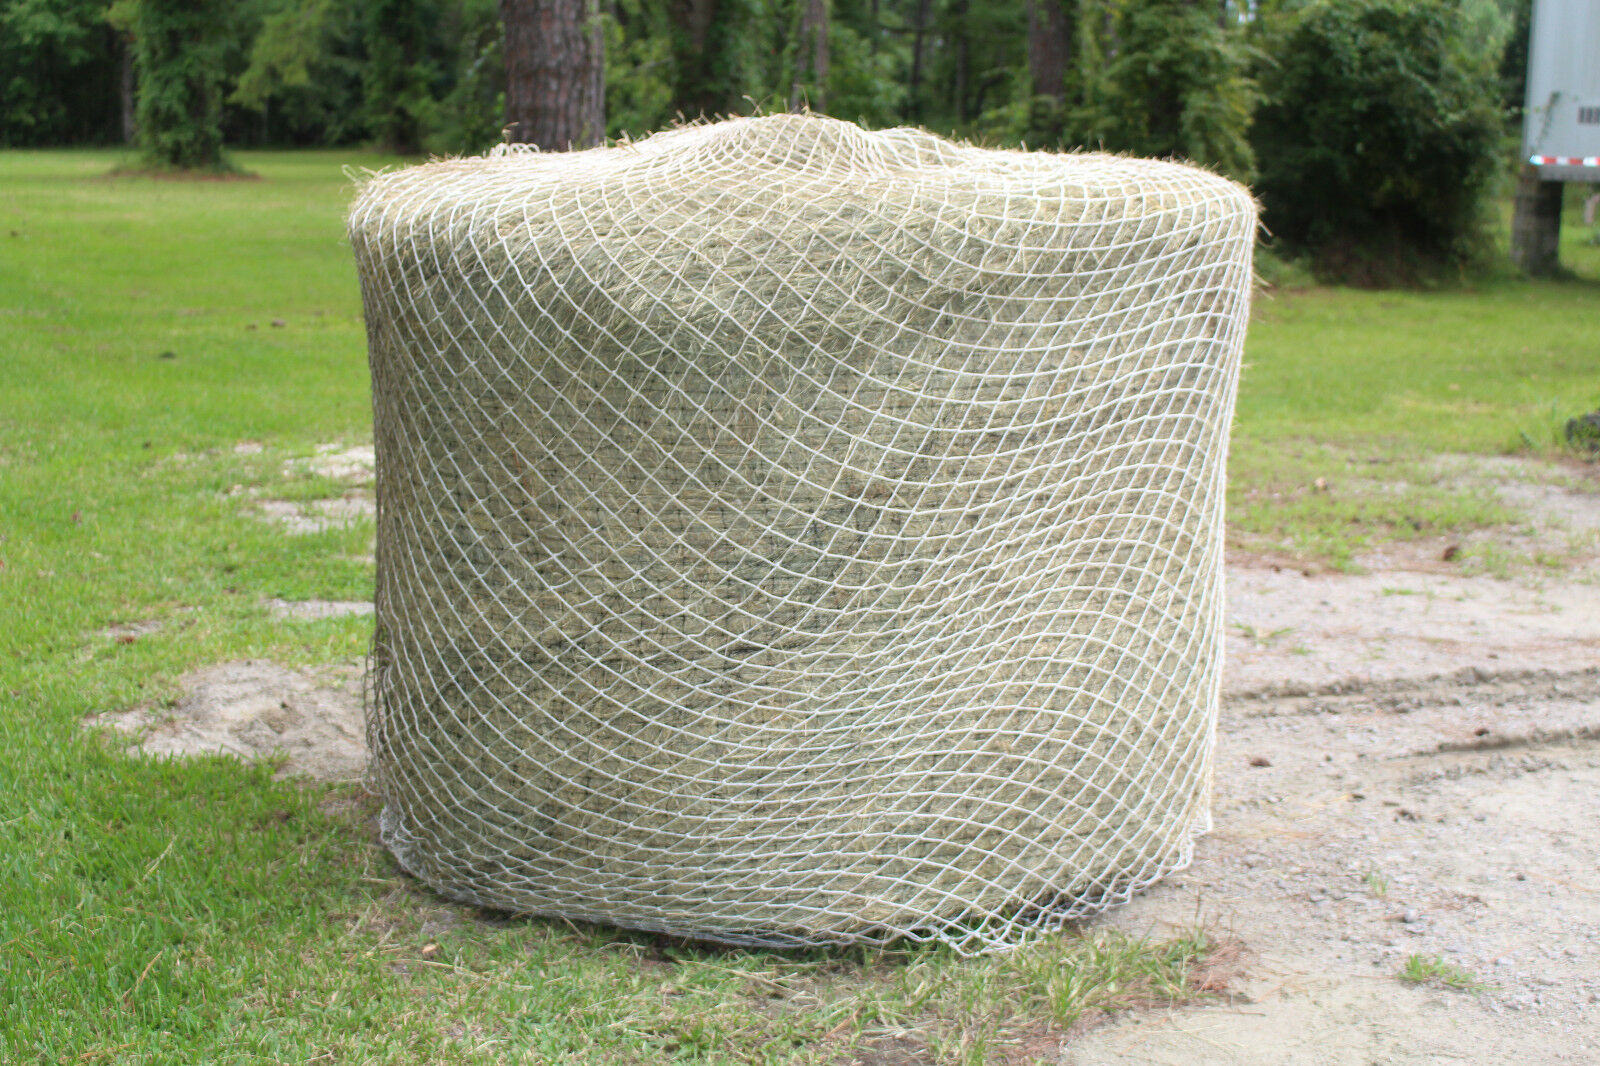 Slow cavallo Hay Round Bale Net Feeder Eliminates Waste 1 12   60  Fits 6' x 6'